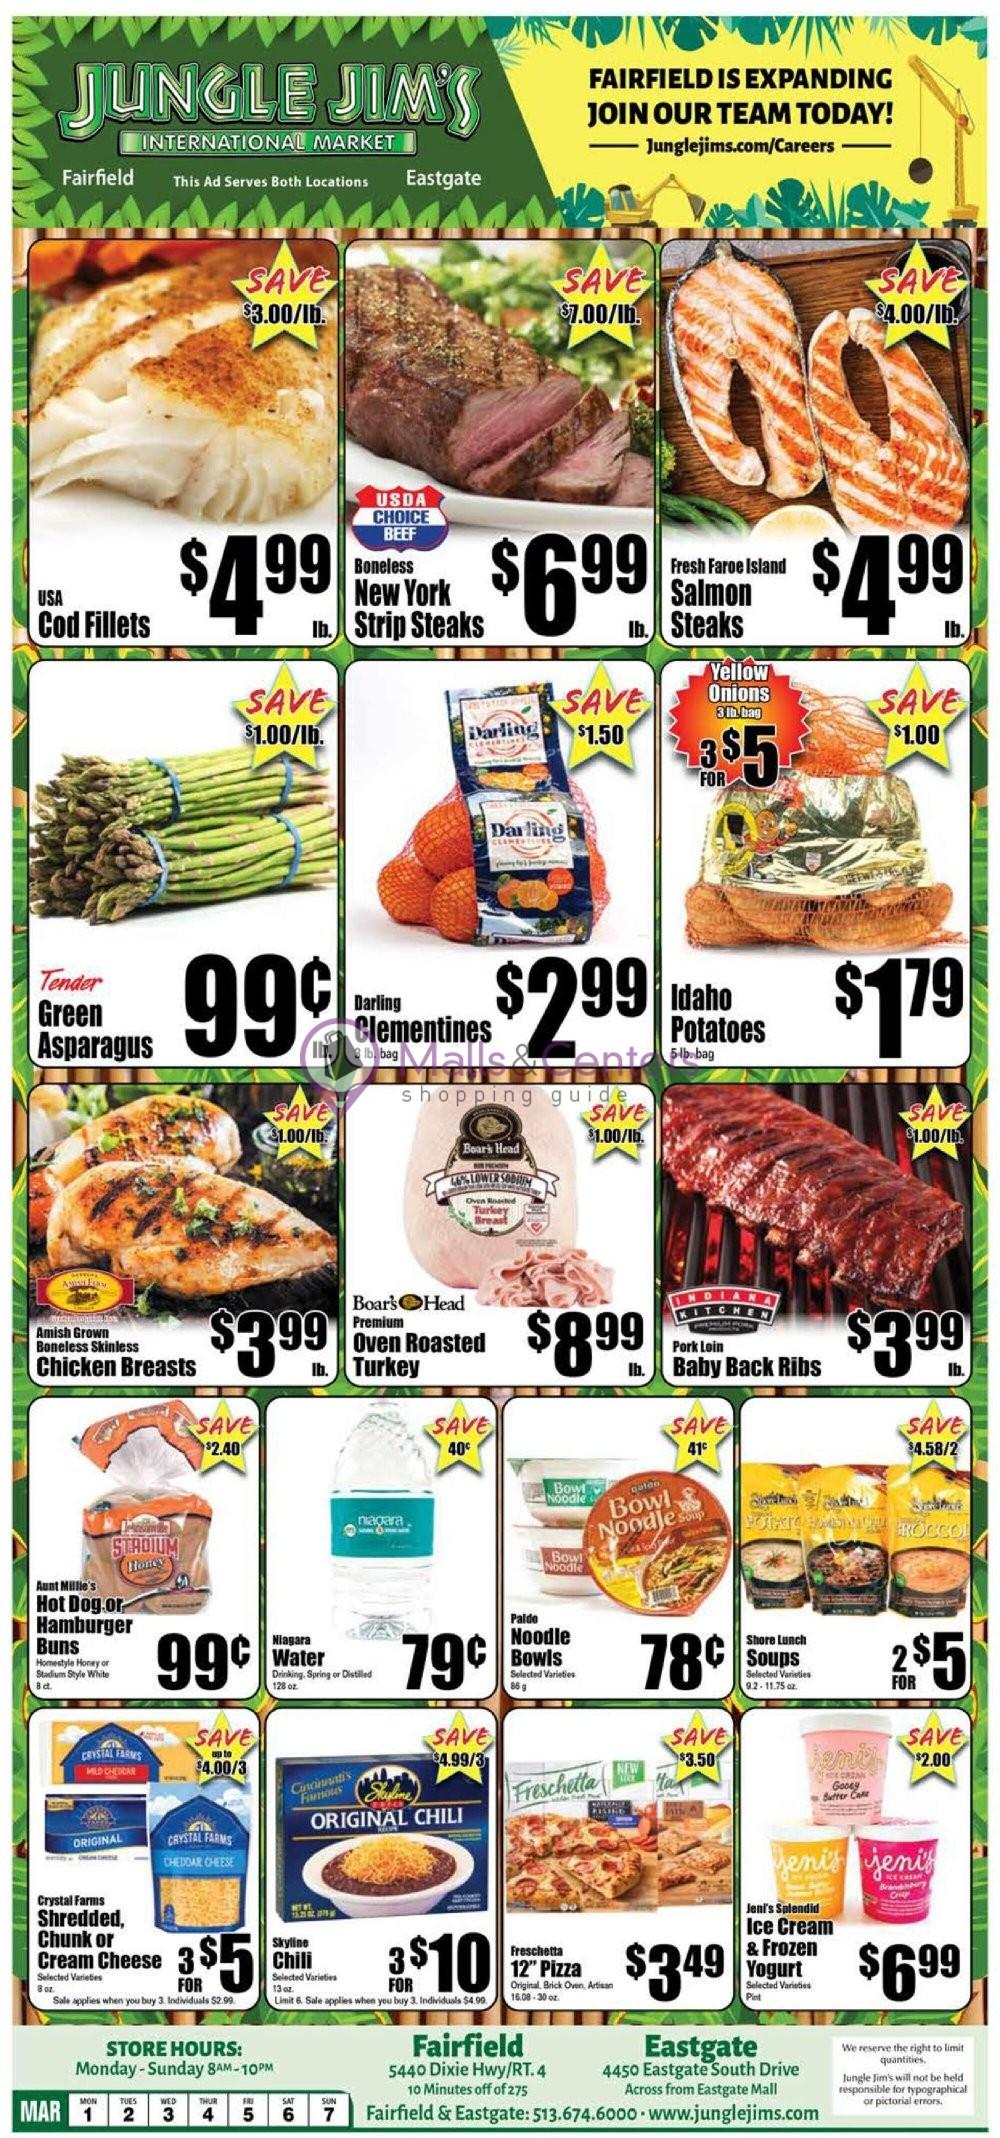 weekly ads Jungle Jim's - page 1 - mallscenters.com